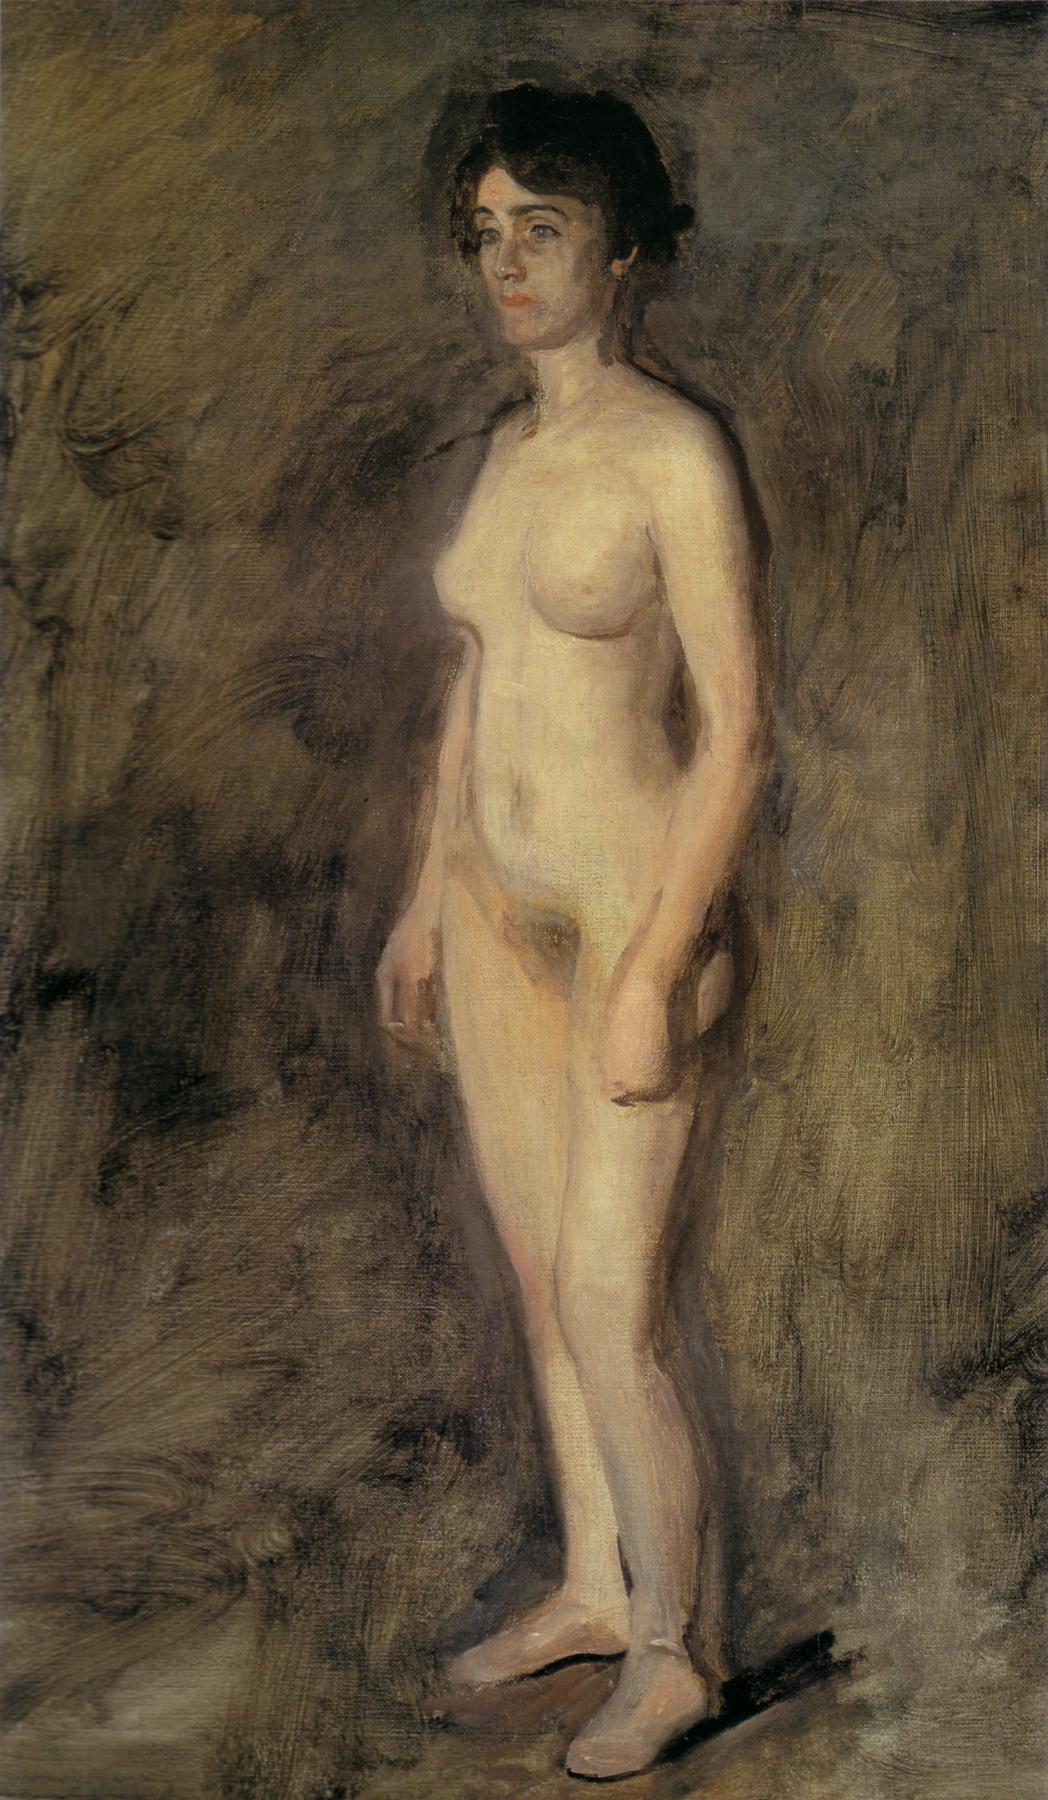 Thomas Eakins. Standing Nude woman